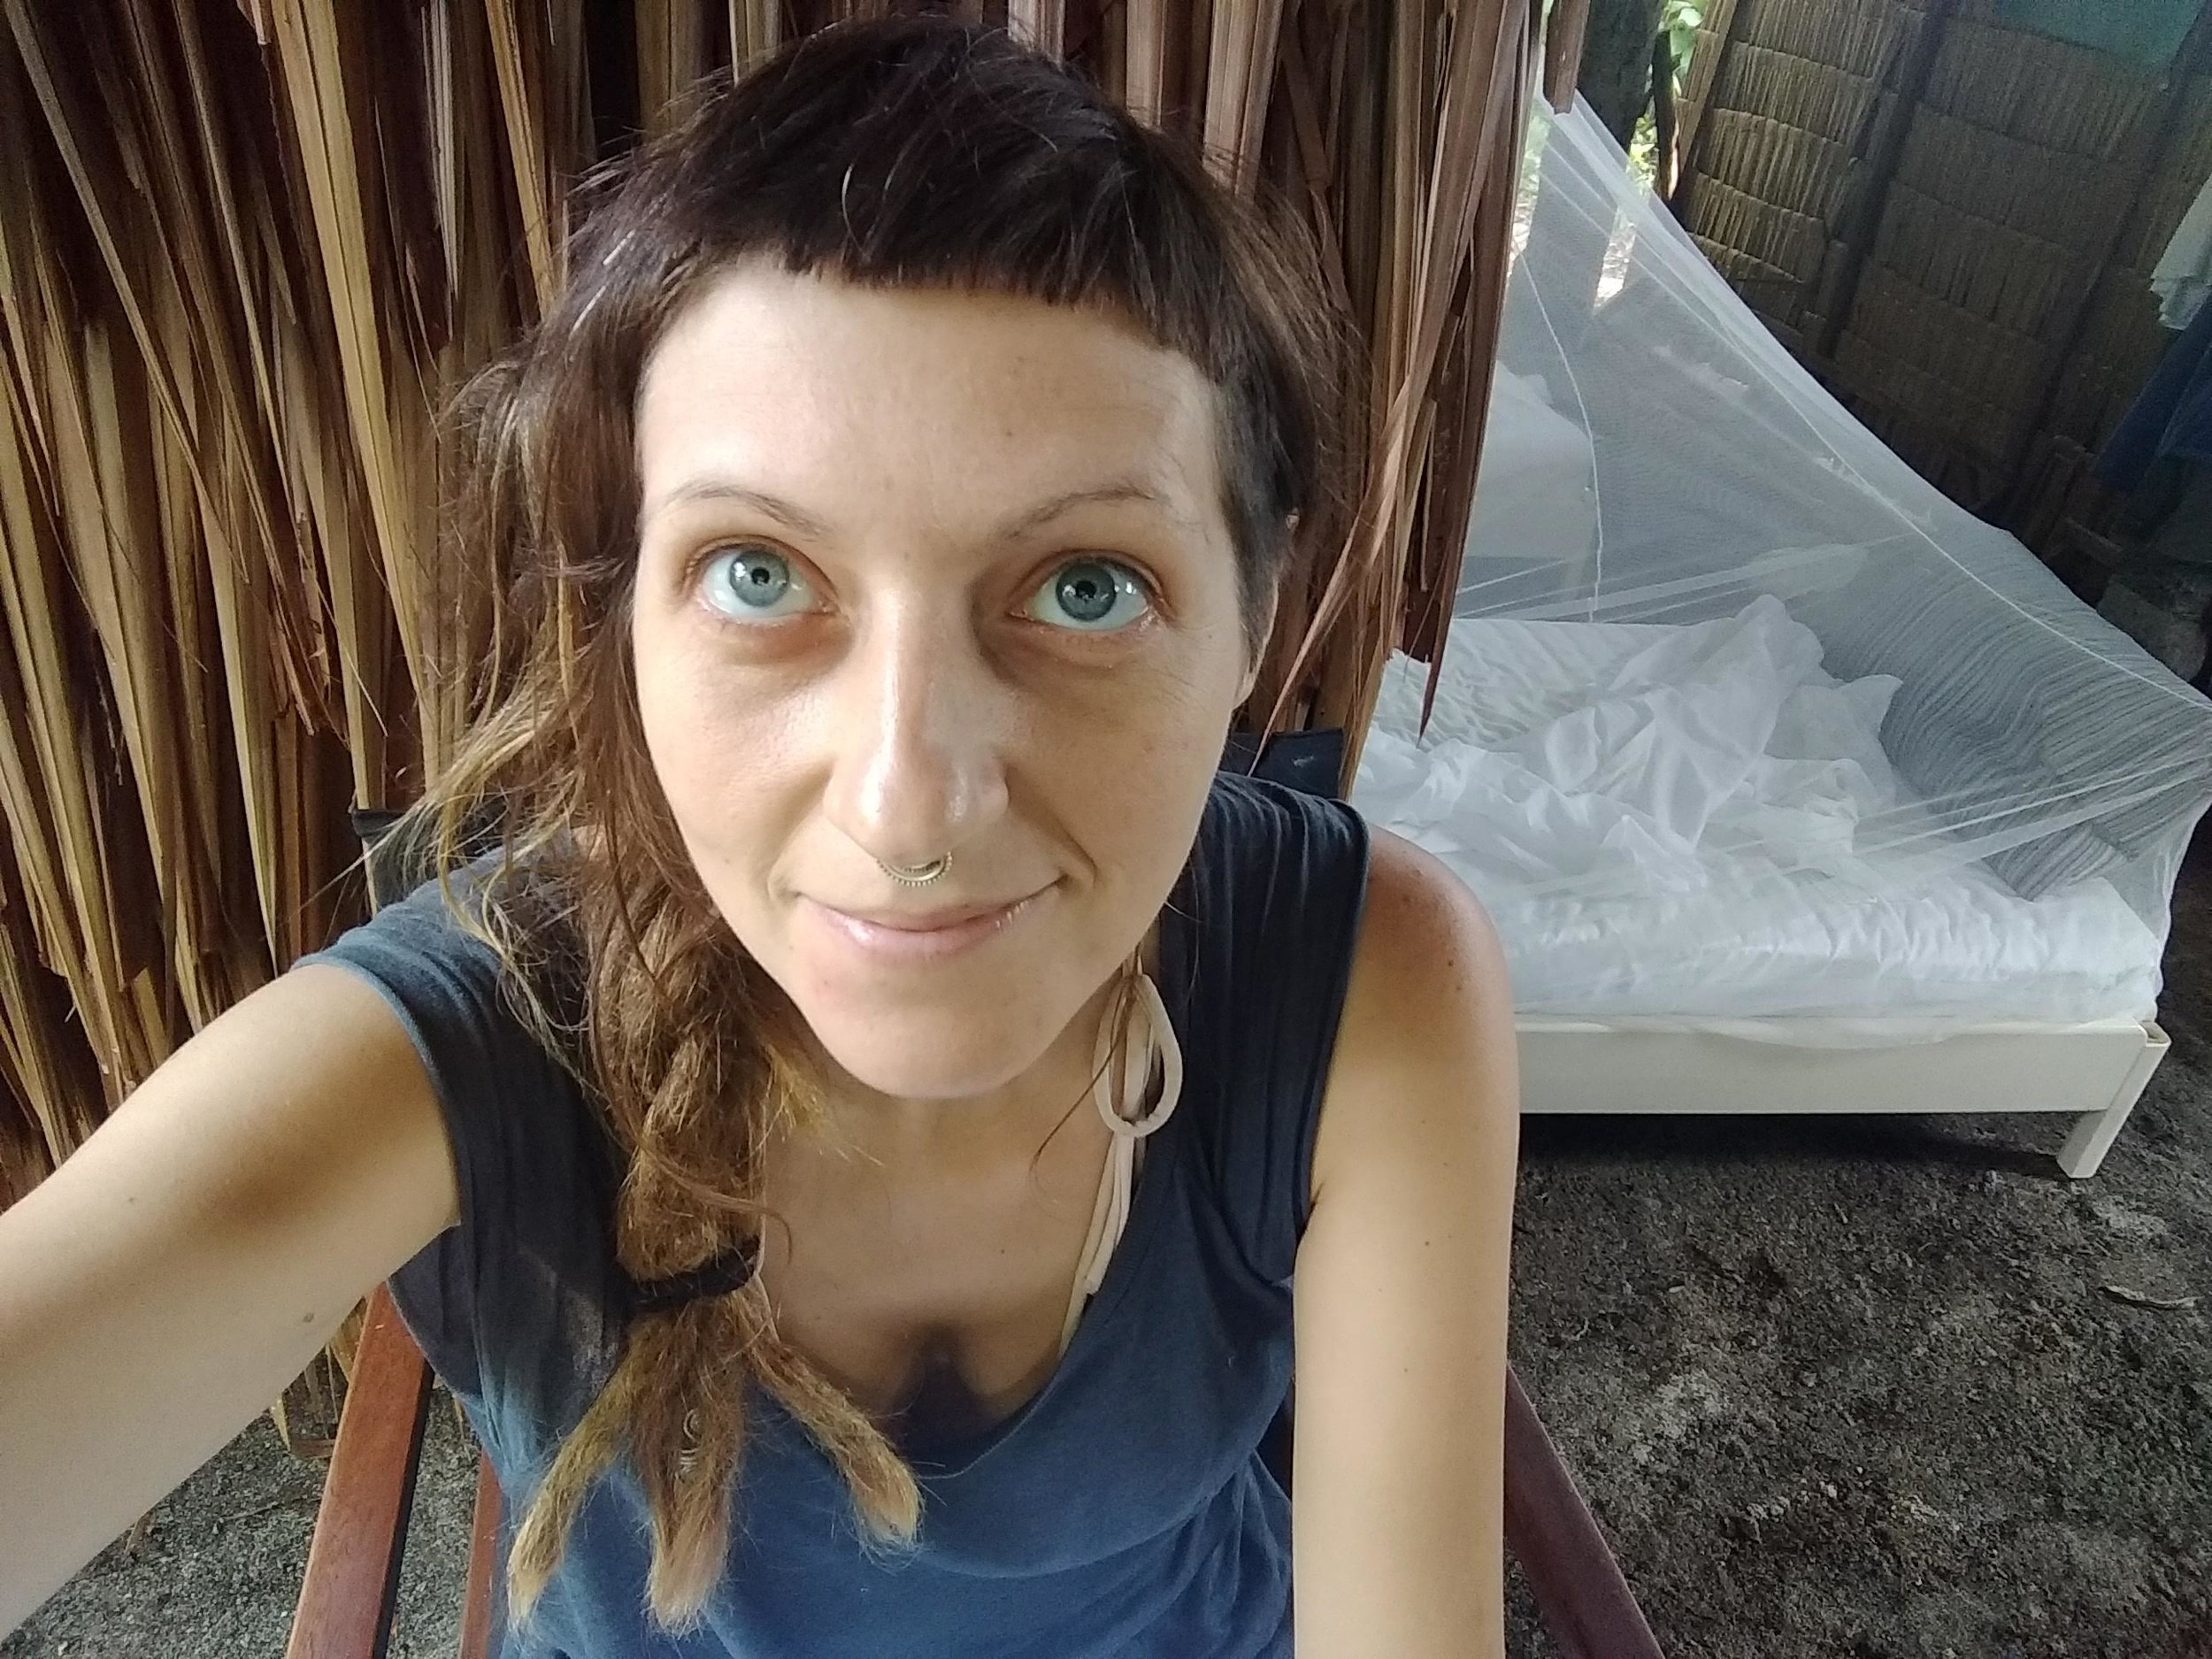 ELOISIA WILD - Social Scientist, Marine Conservation, scubadiver, freediver, keen sailor, ocean protector and adventurer.#oceanoptimism #noiinteam